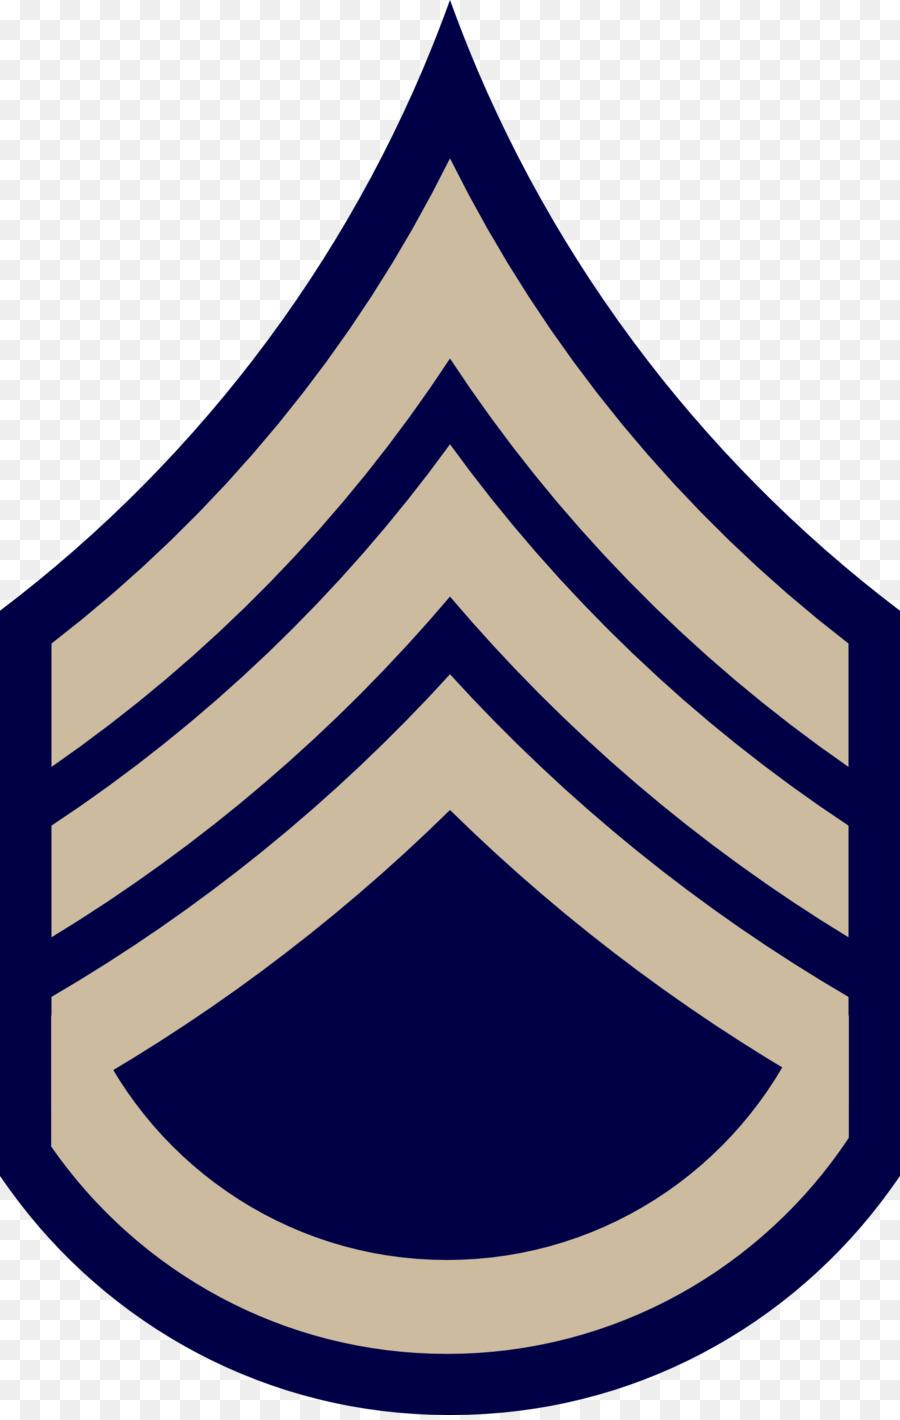 Staff sergeant clipart jpg transparent download Army Cartoon png download - 1550*2437 - Free Transparent ... jpg transparent download